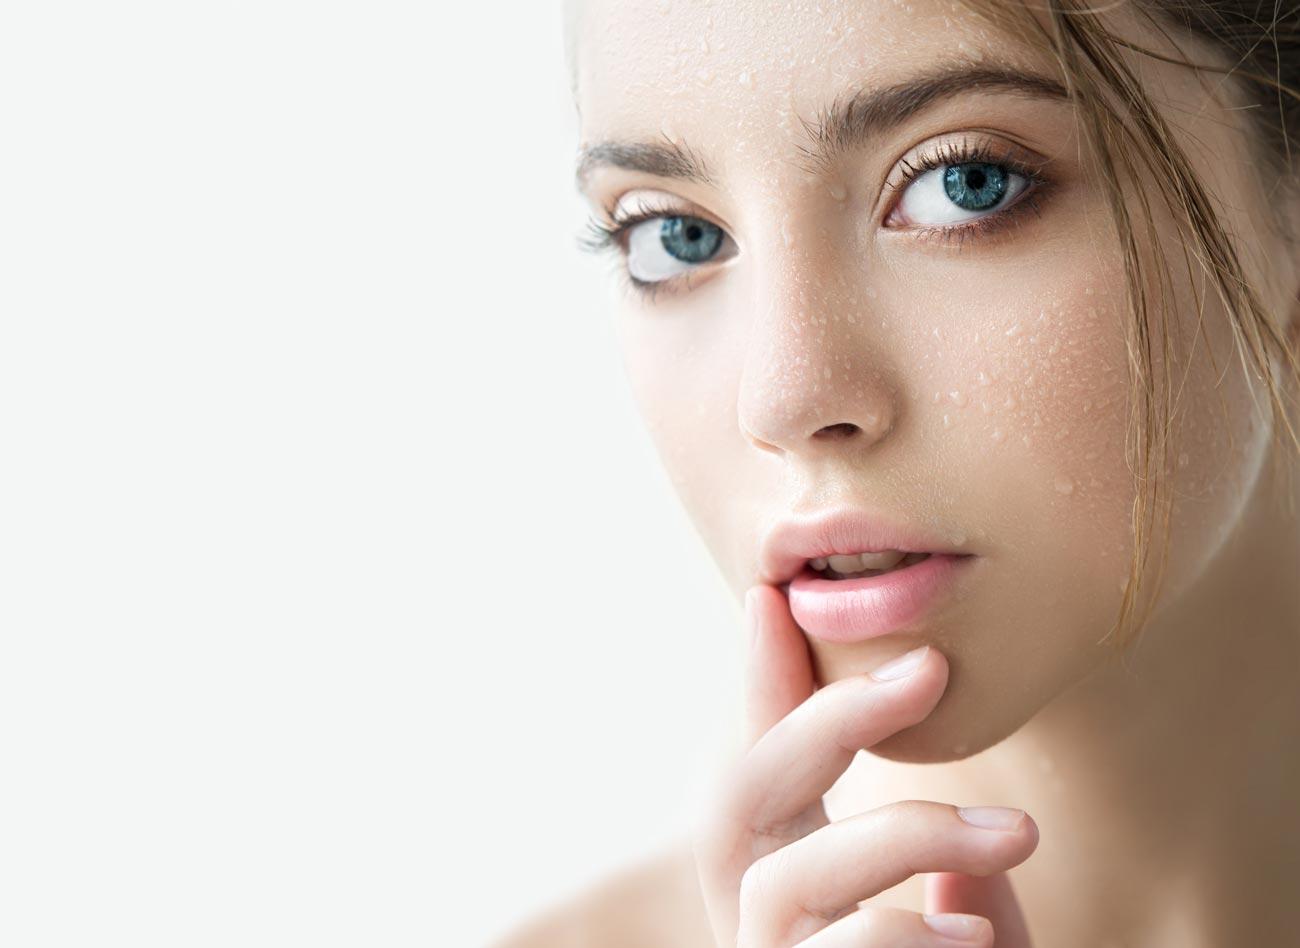 mésothérapie visage